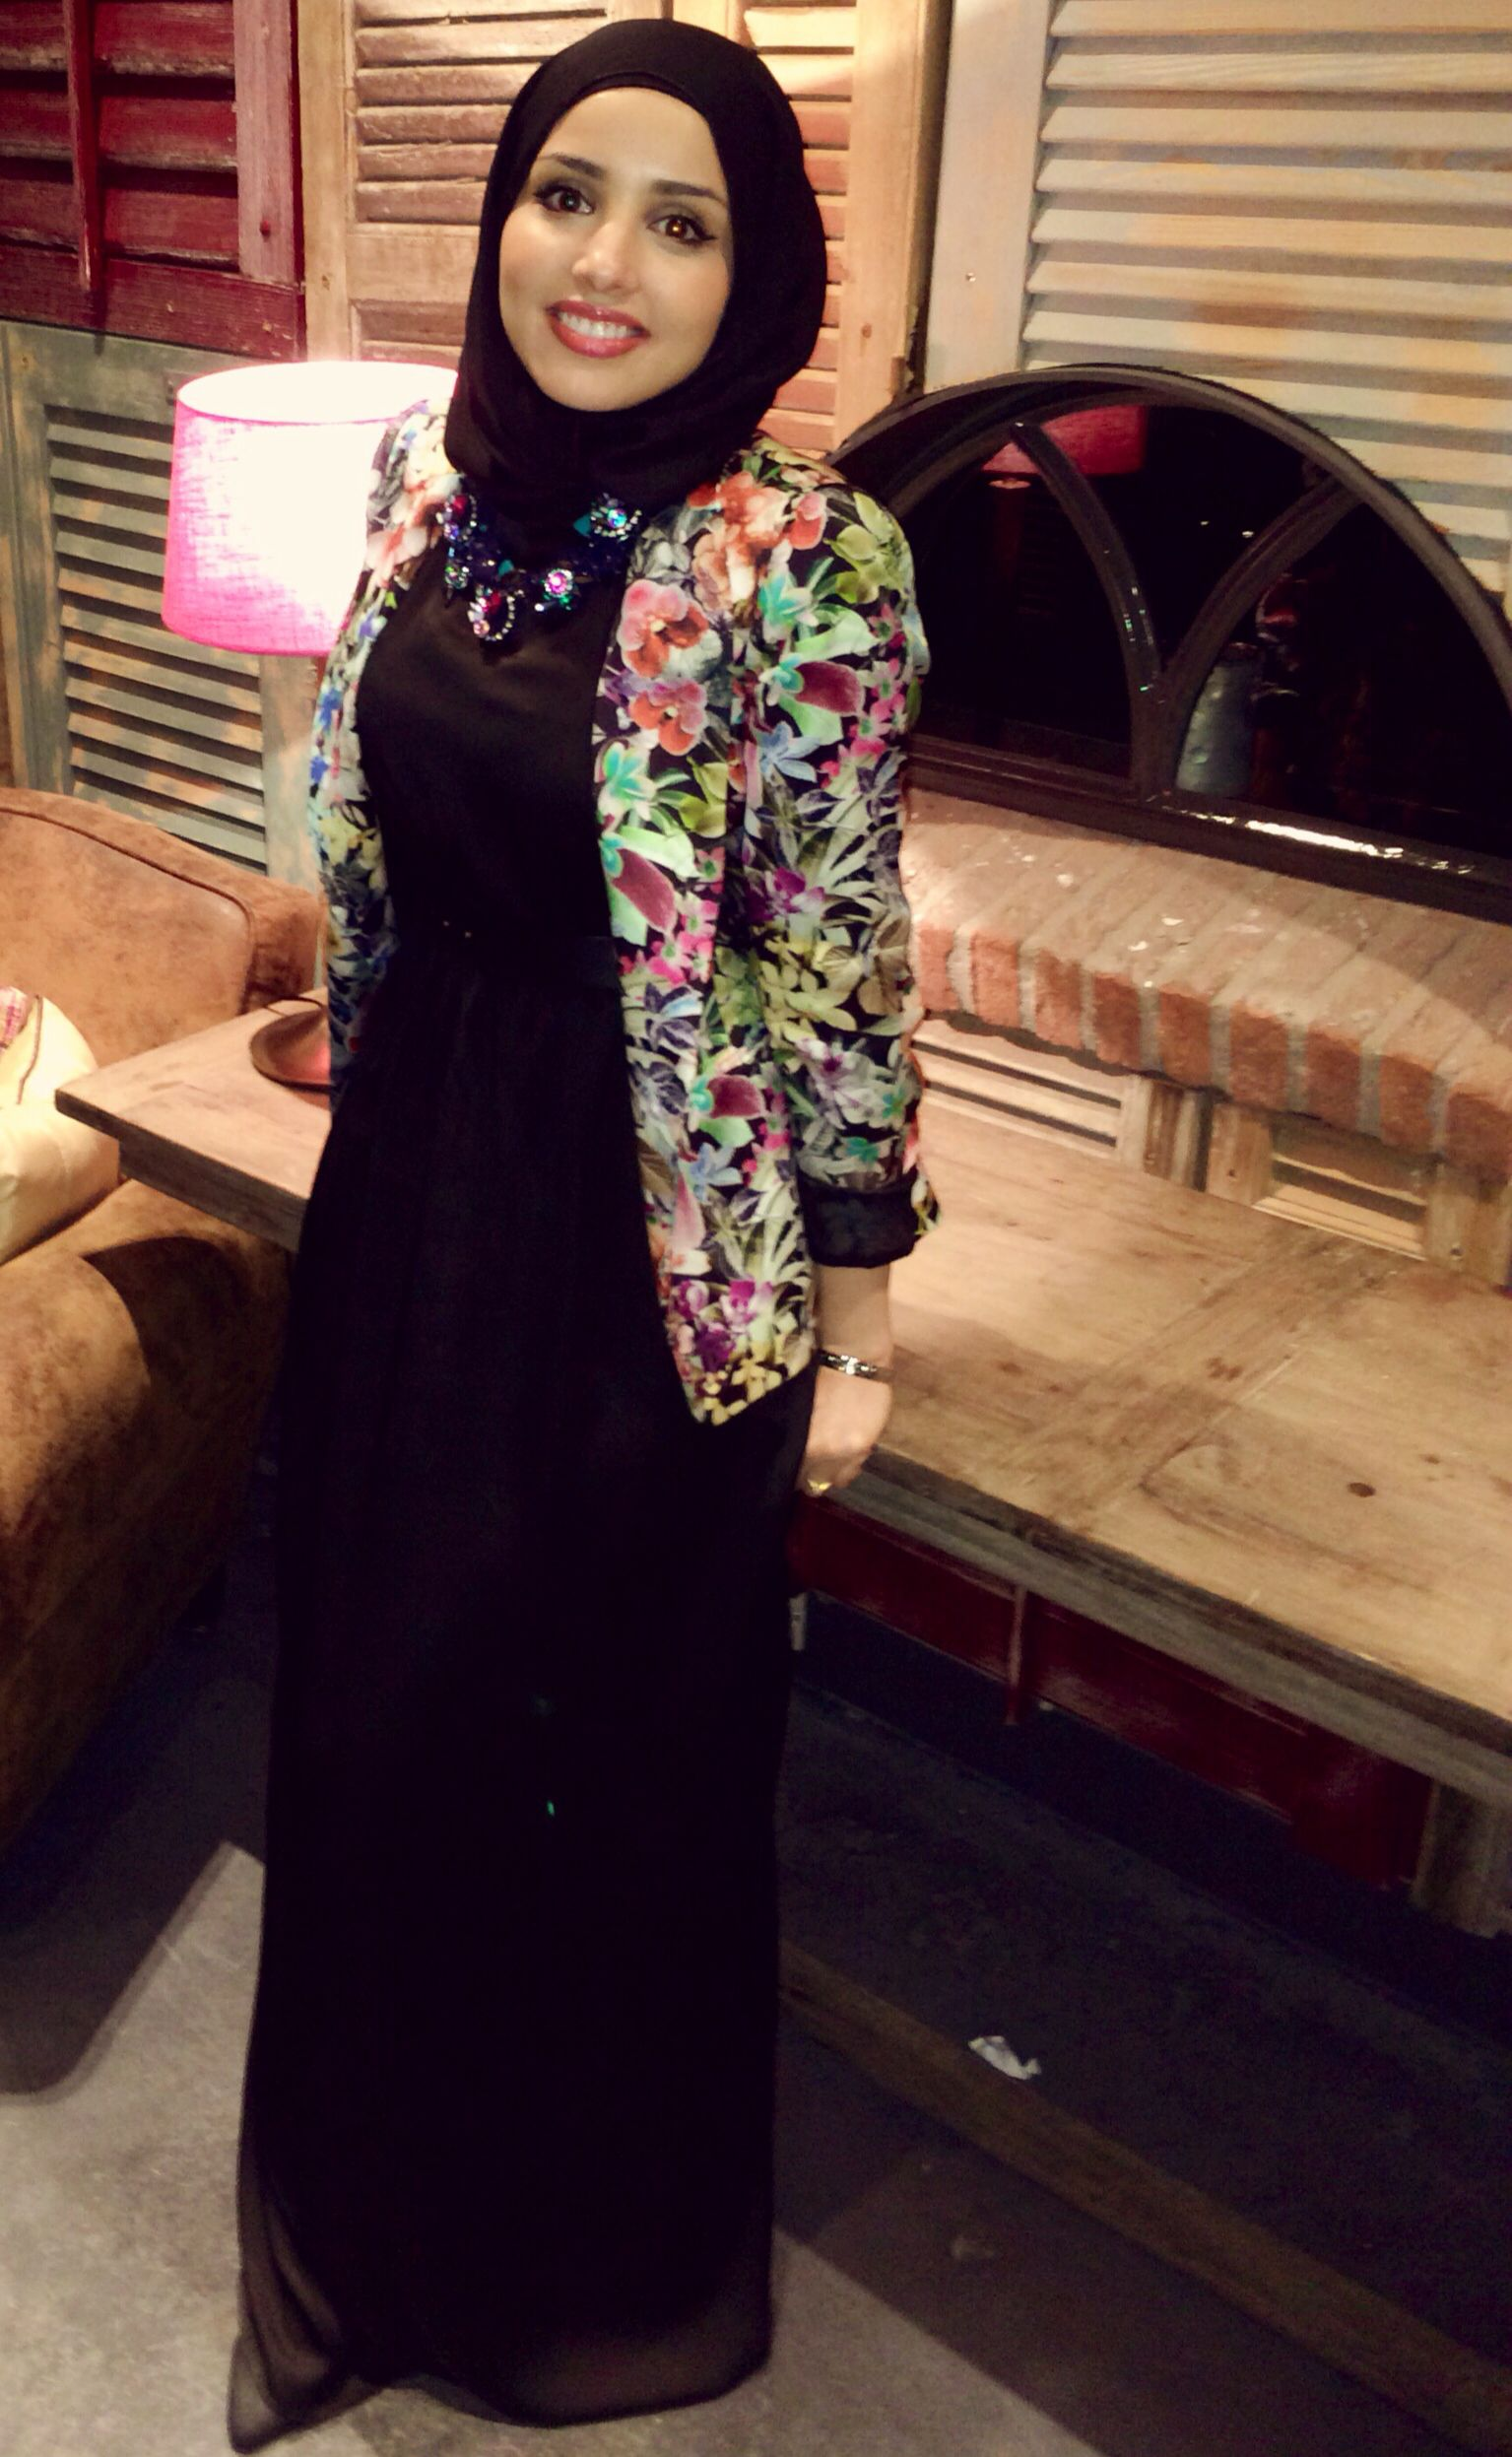 Modesty hijab fashion | Hijab Fashion | Pinterest | Islamische mode ...